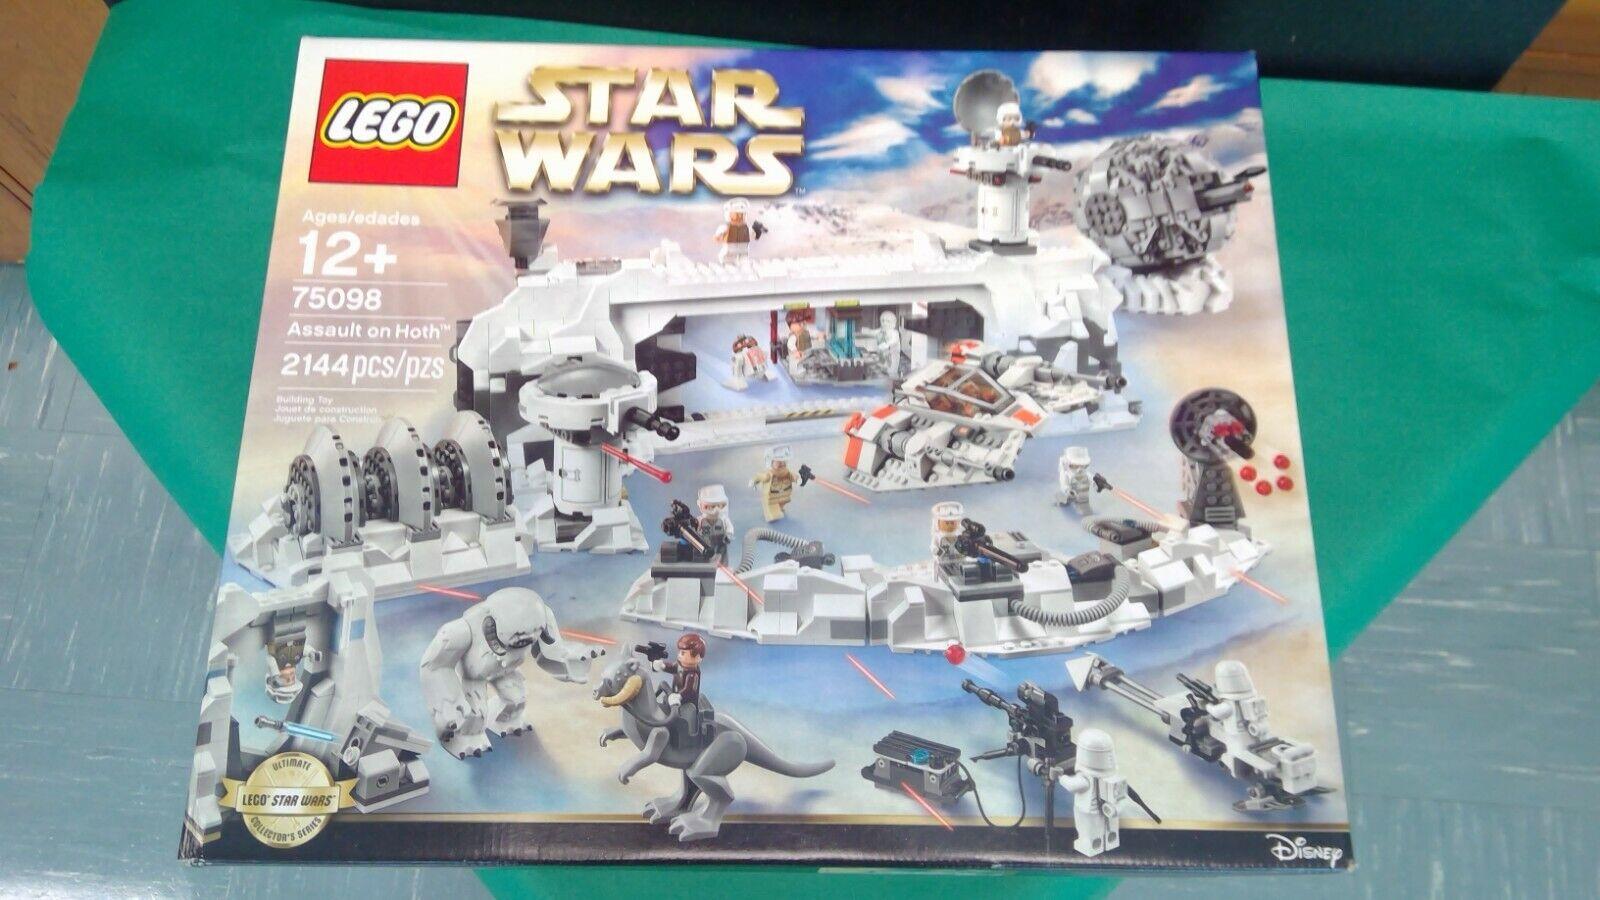 Authentic LEGO Star Wars Luke Skywalker Minifigure sw731 75098 Assault on Hoth